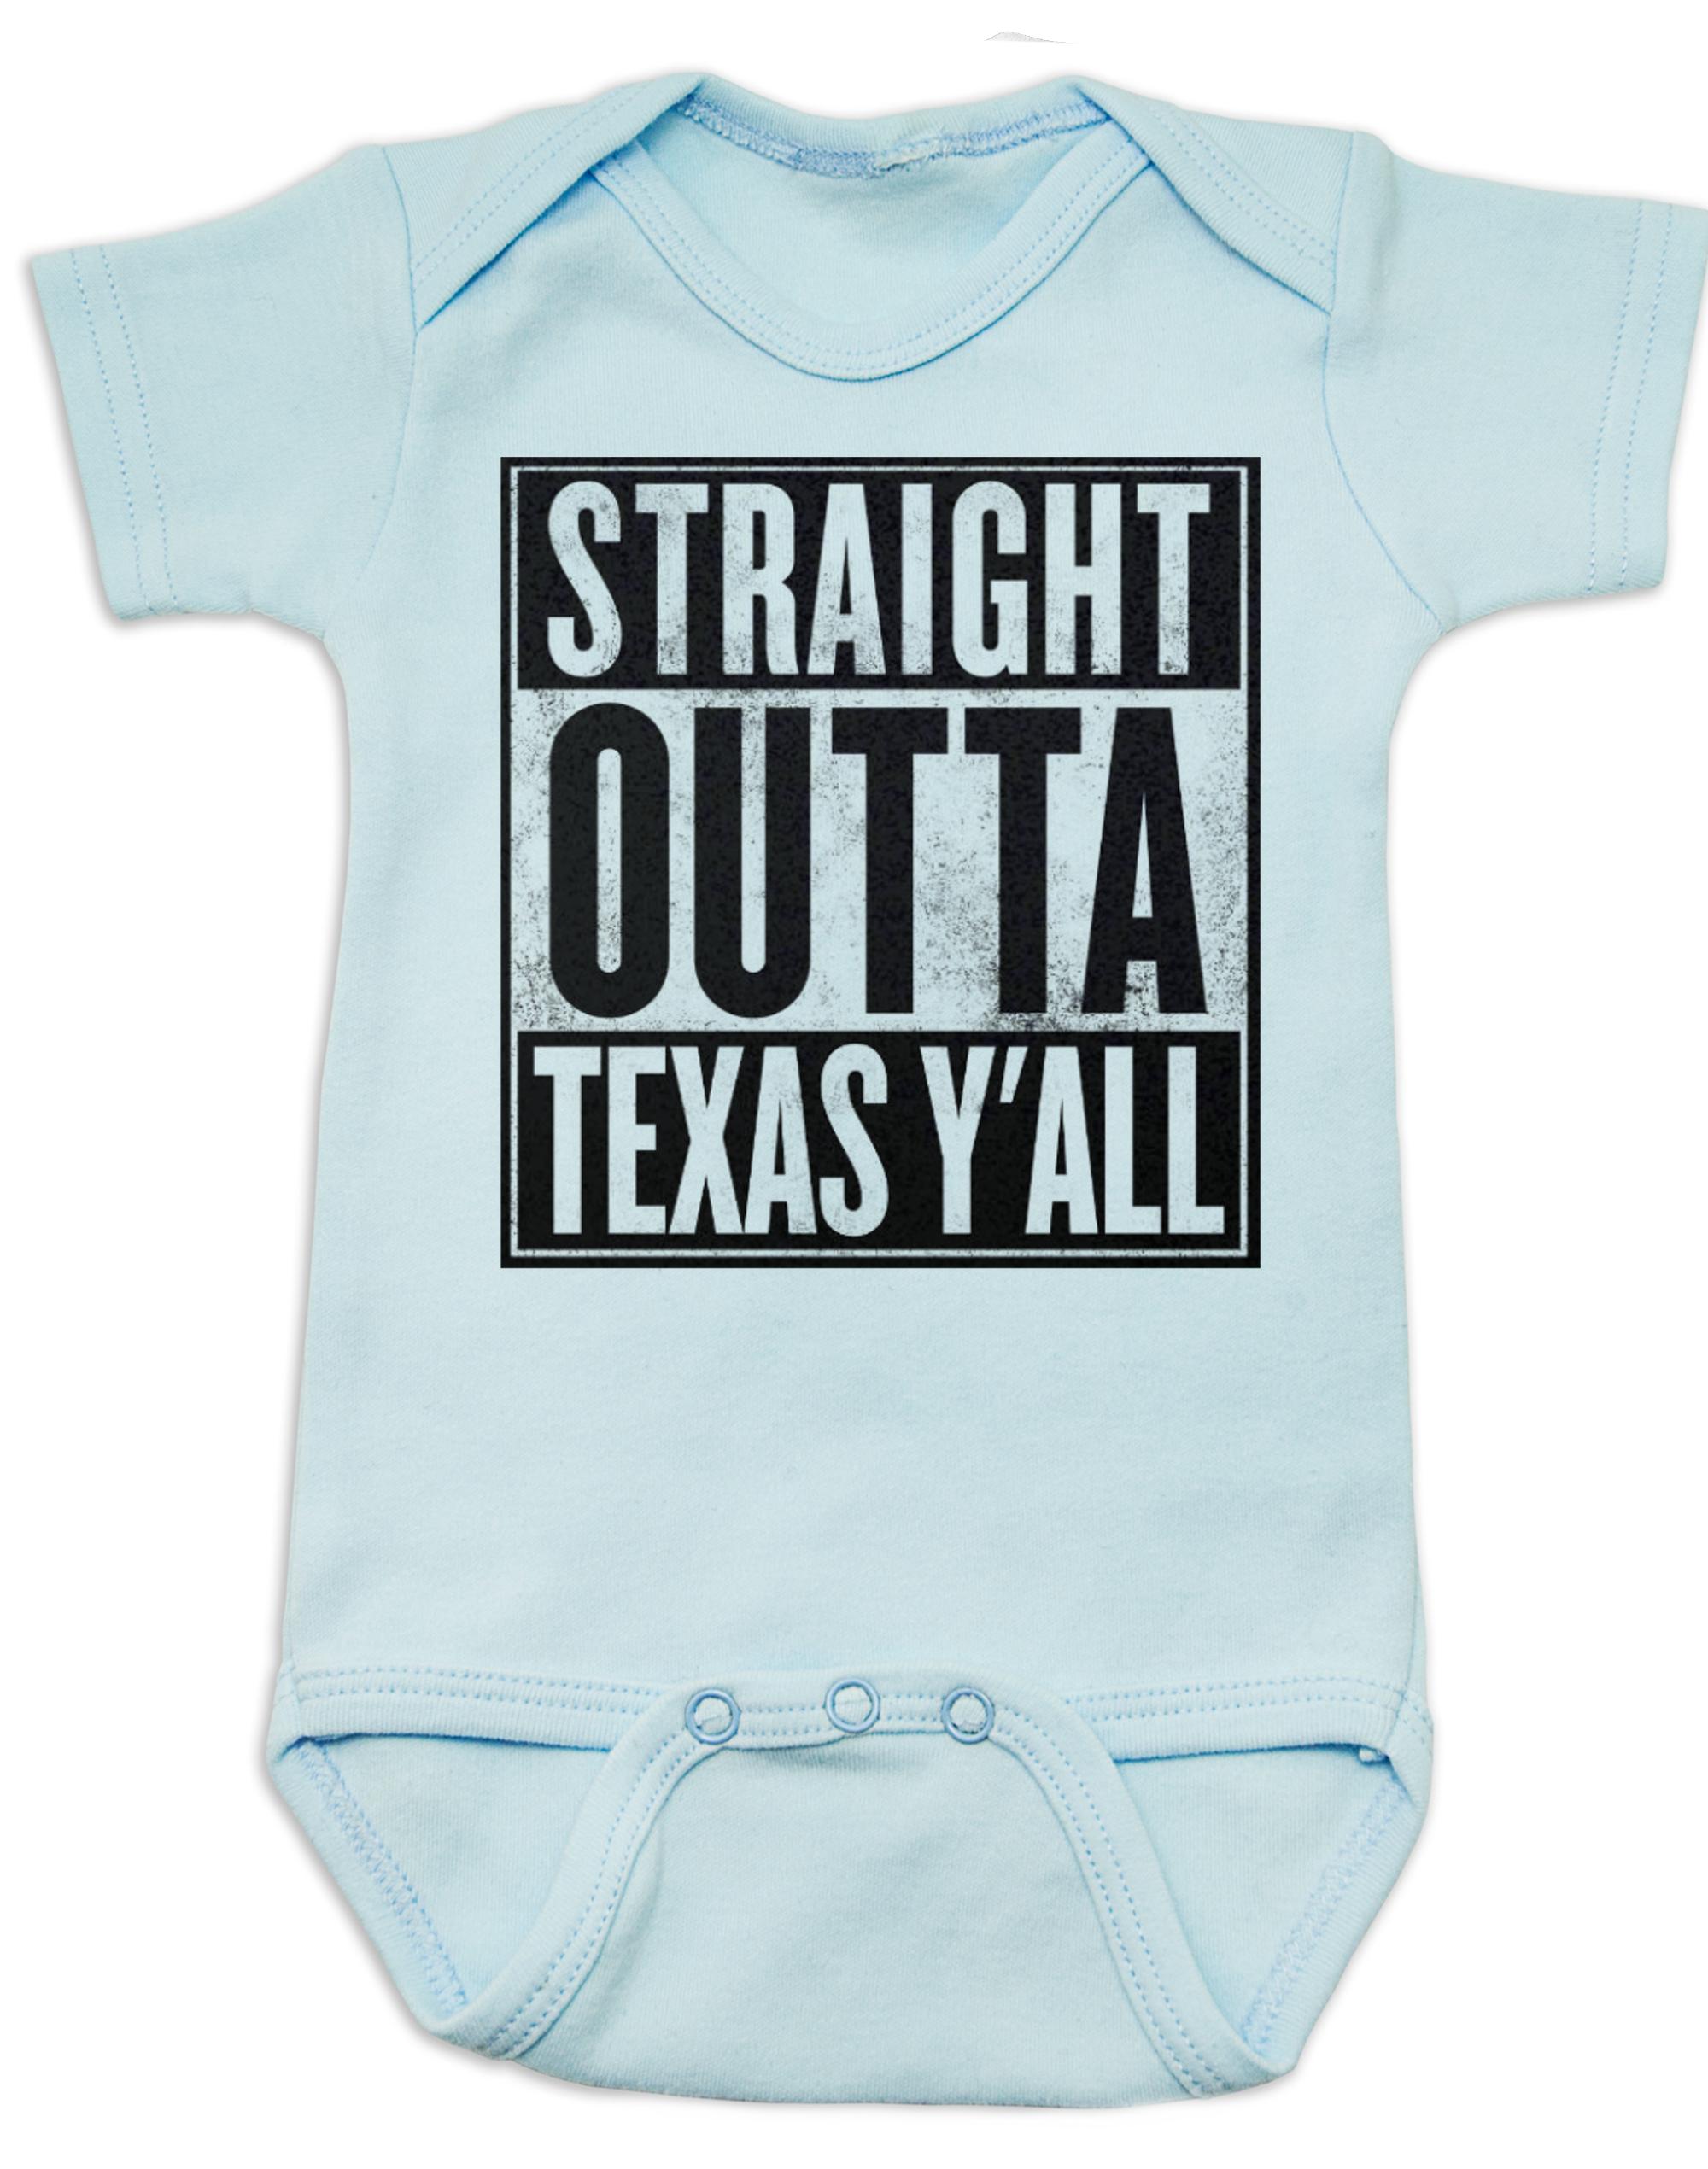 Straight Outta Mommy The story of the misunderstood onesie Vulgar